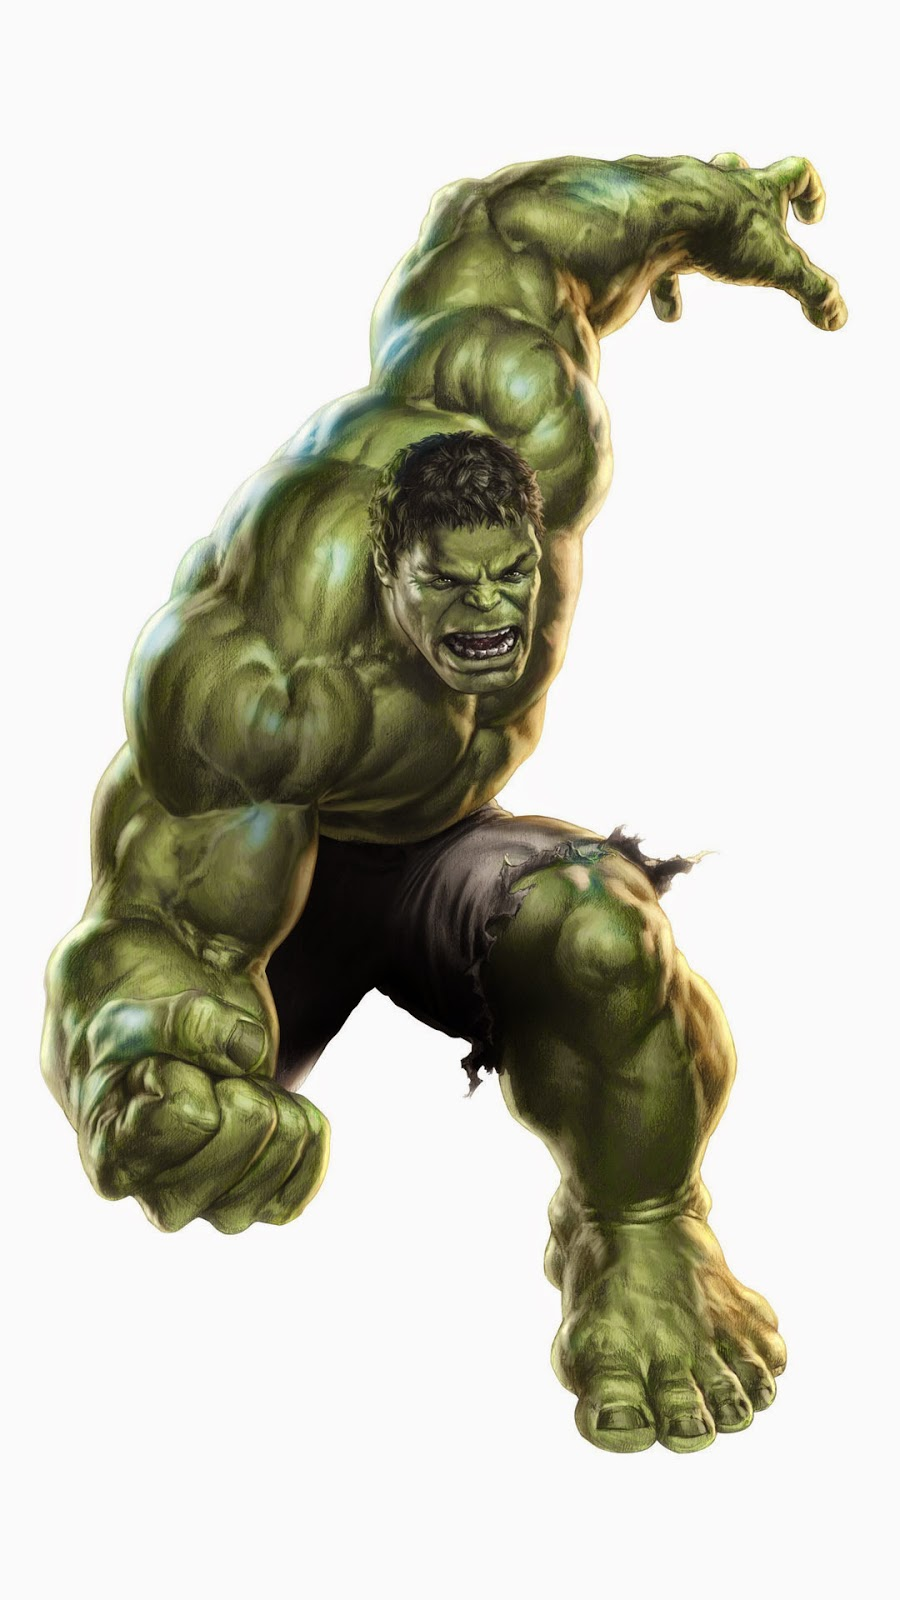 comic cartoons the hulk